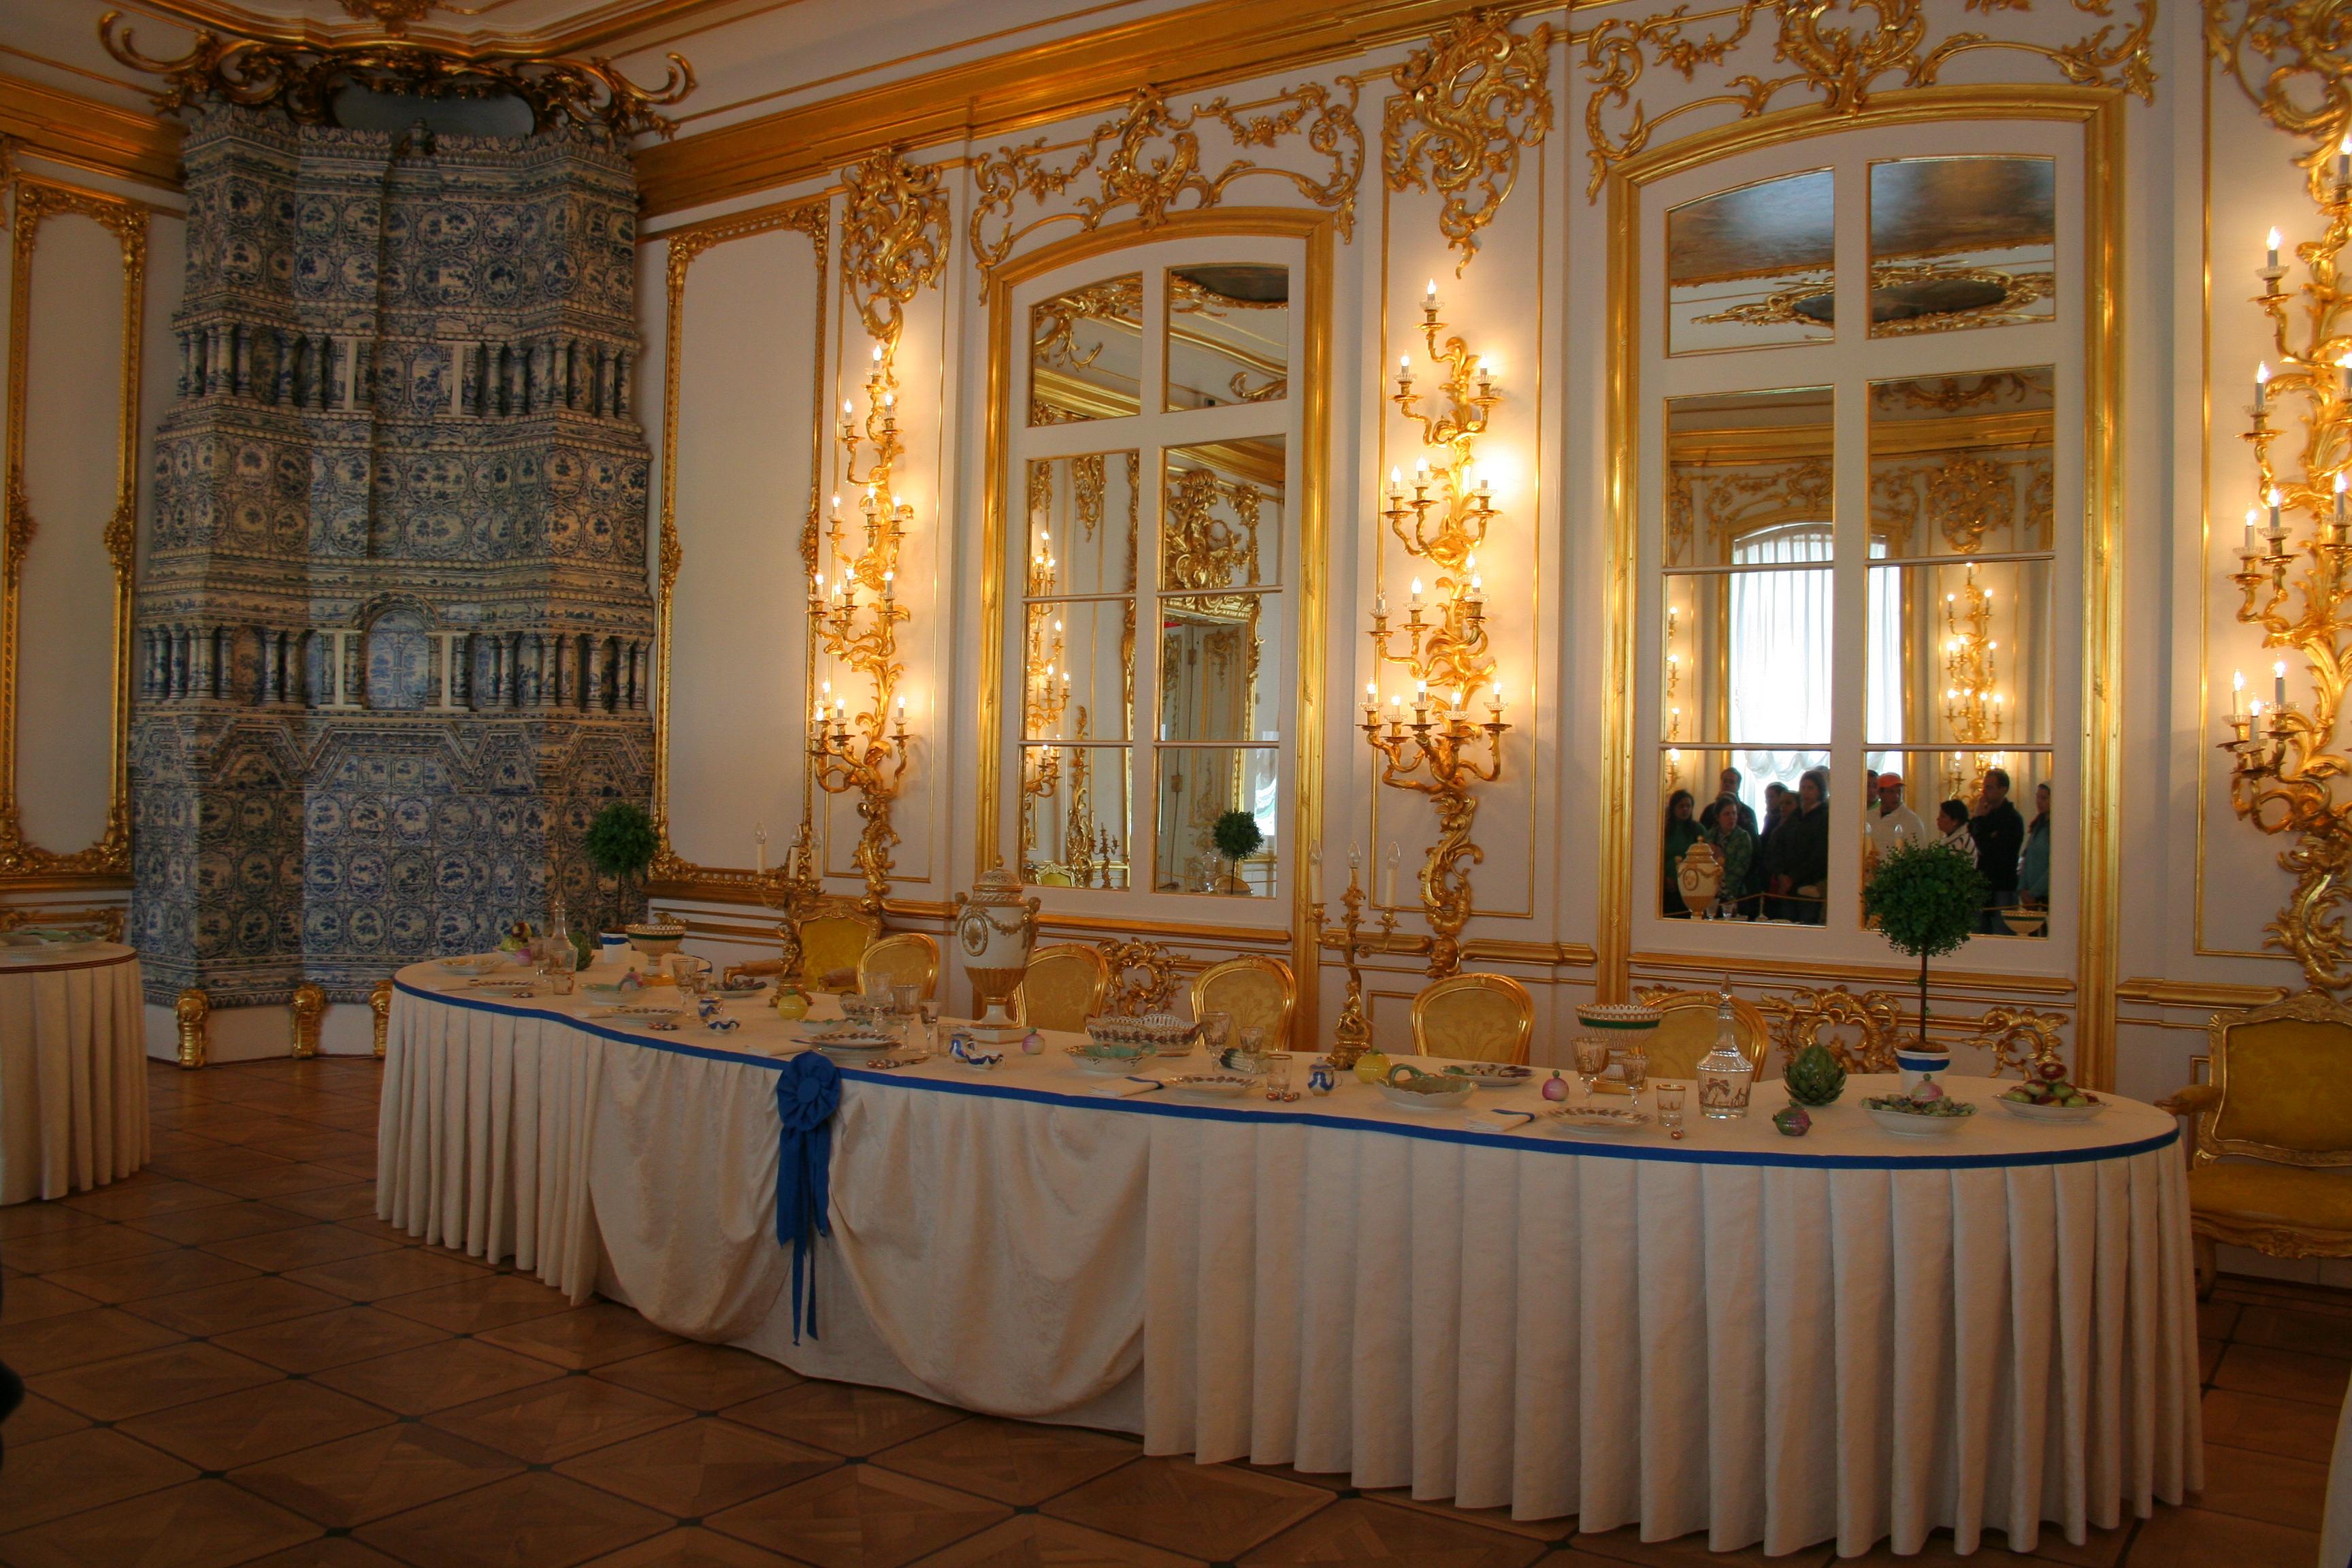 Description Pushkin Catherine Palace Interiors 05.jpg